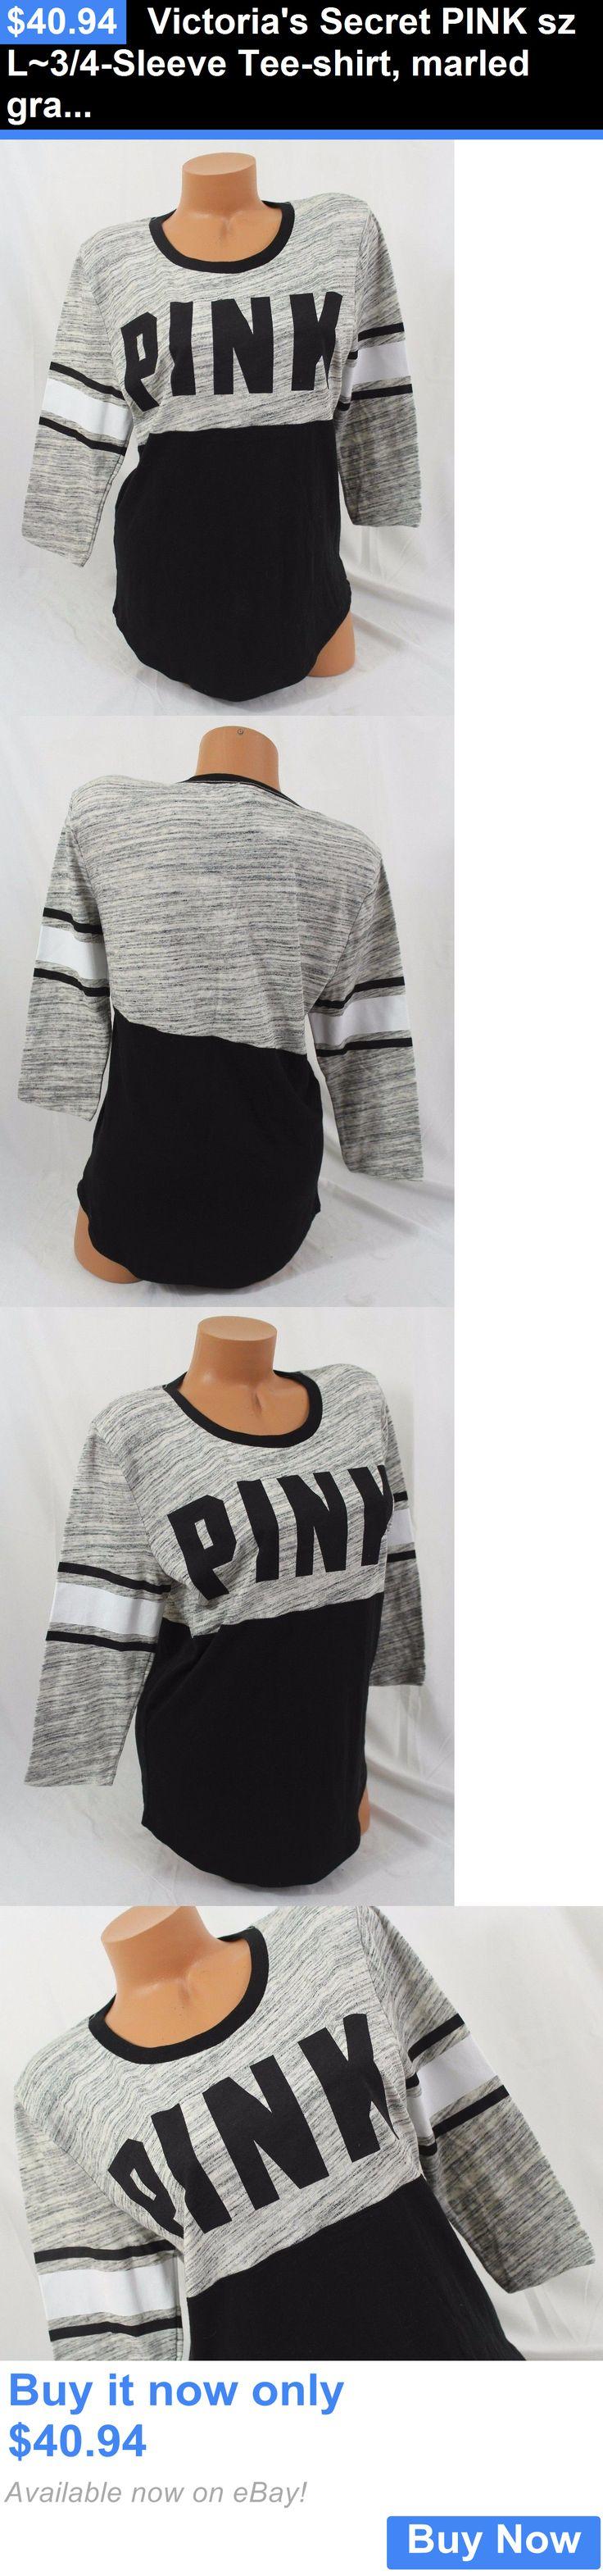 Women T Shirts: Victorias Secret Pink Sz L~3/4-Sleeve Tee-Shirt, Marled Gray/Black Stripe BUY IT NOW ONLY: $40.94